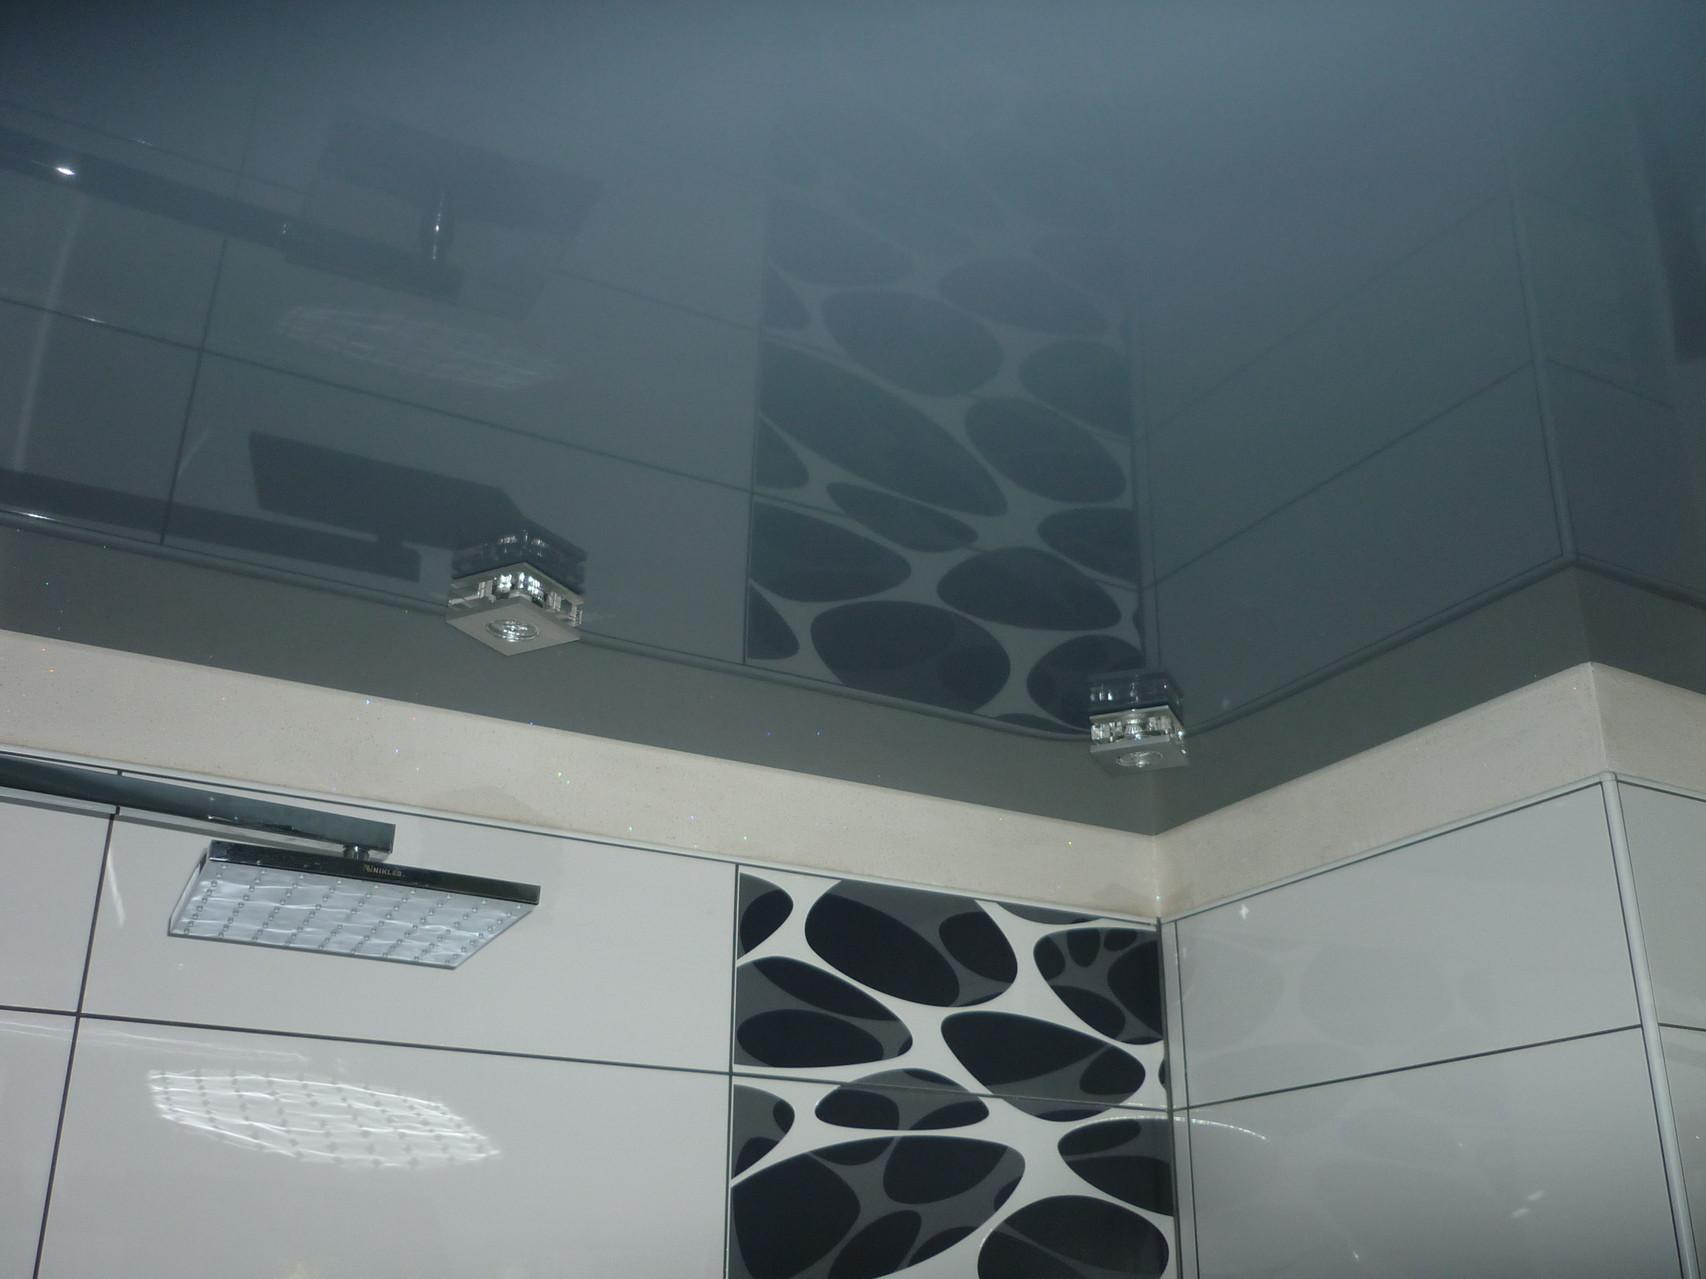 Spanndecke Grau glänzend Iserlohn Badezimmer